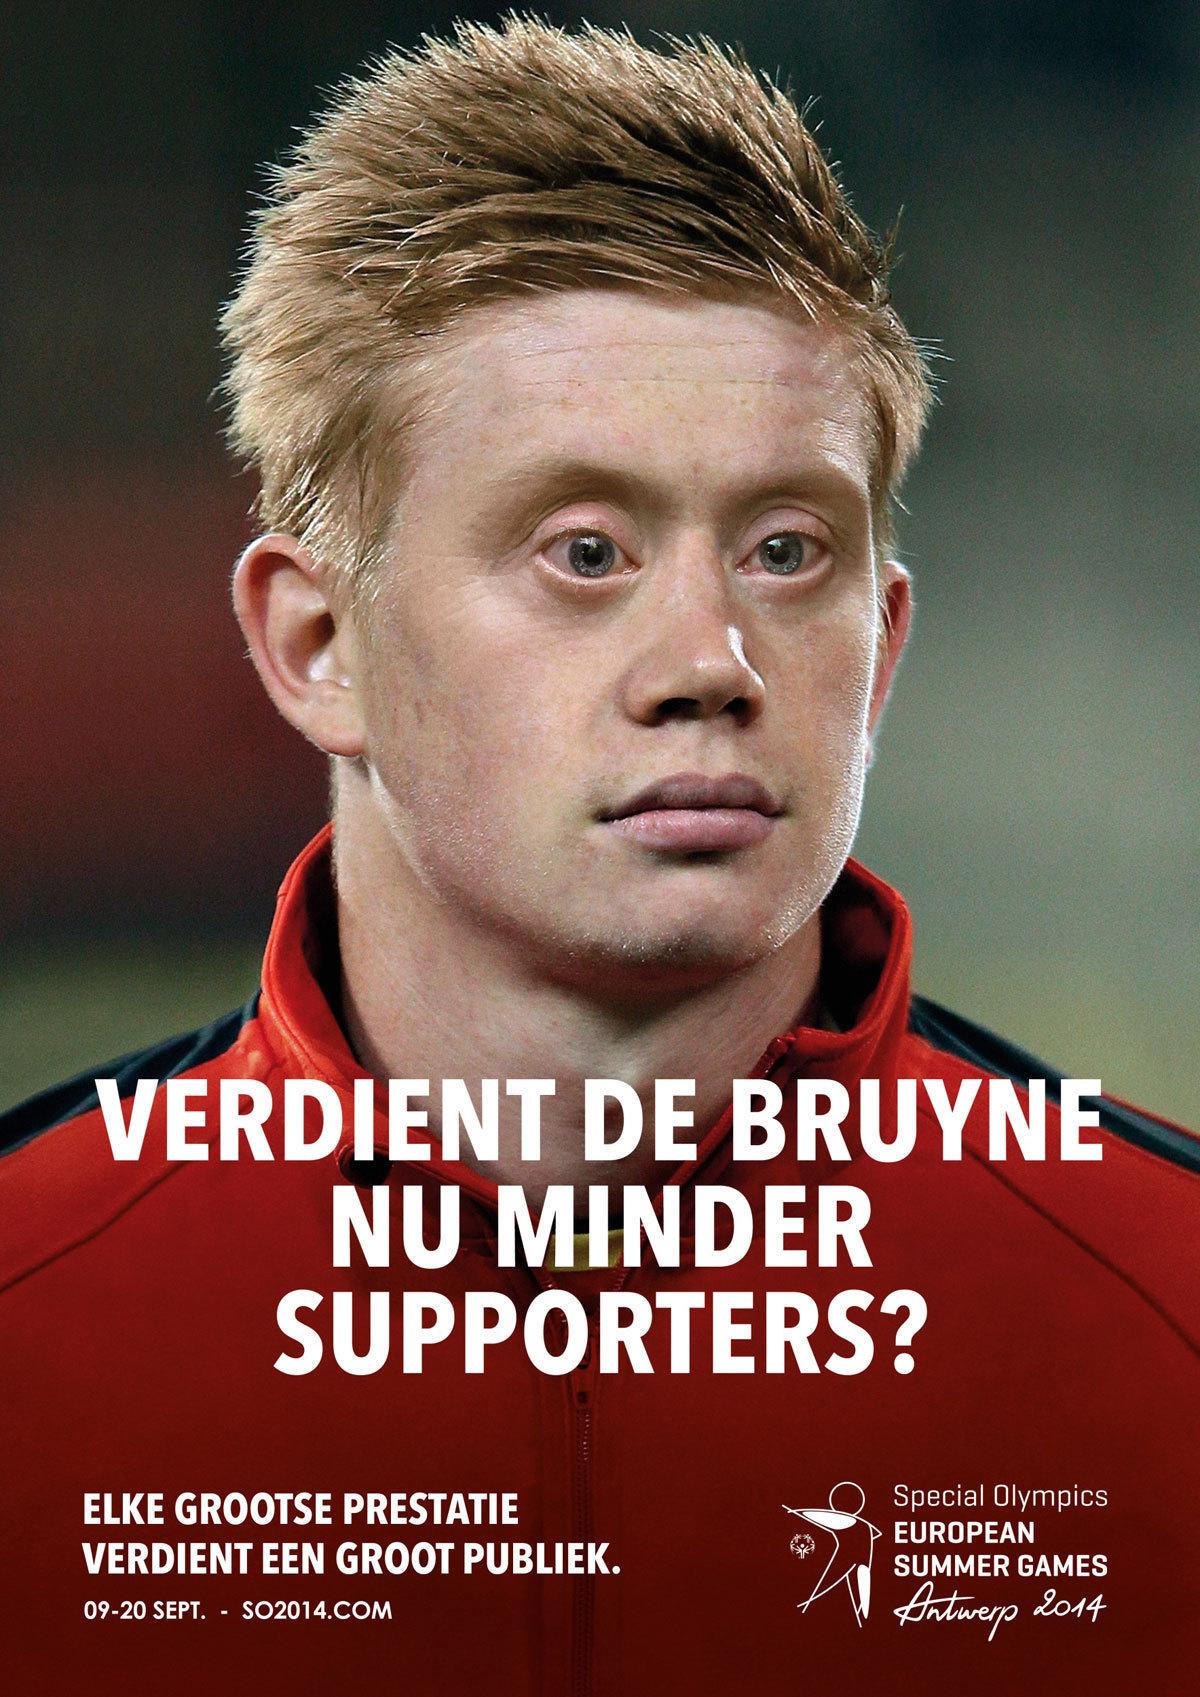 Special olympics belgium kevin de bruyne